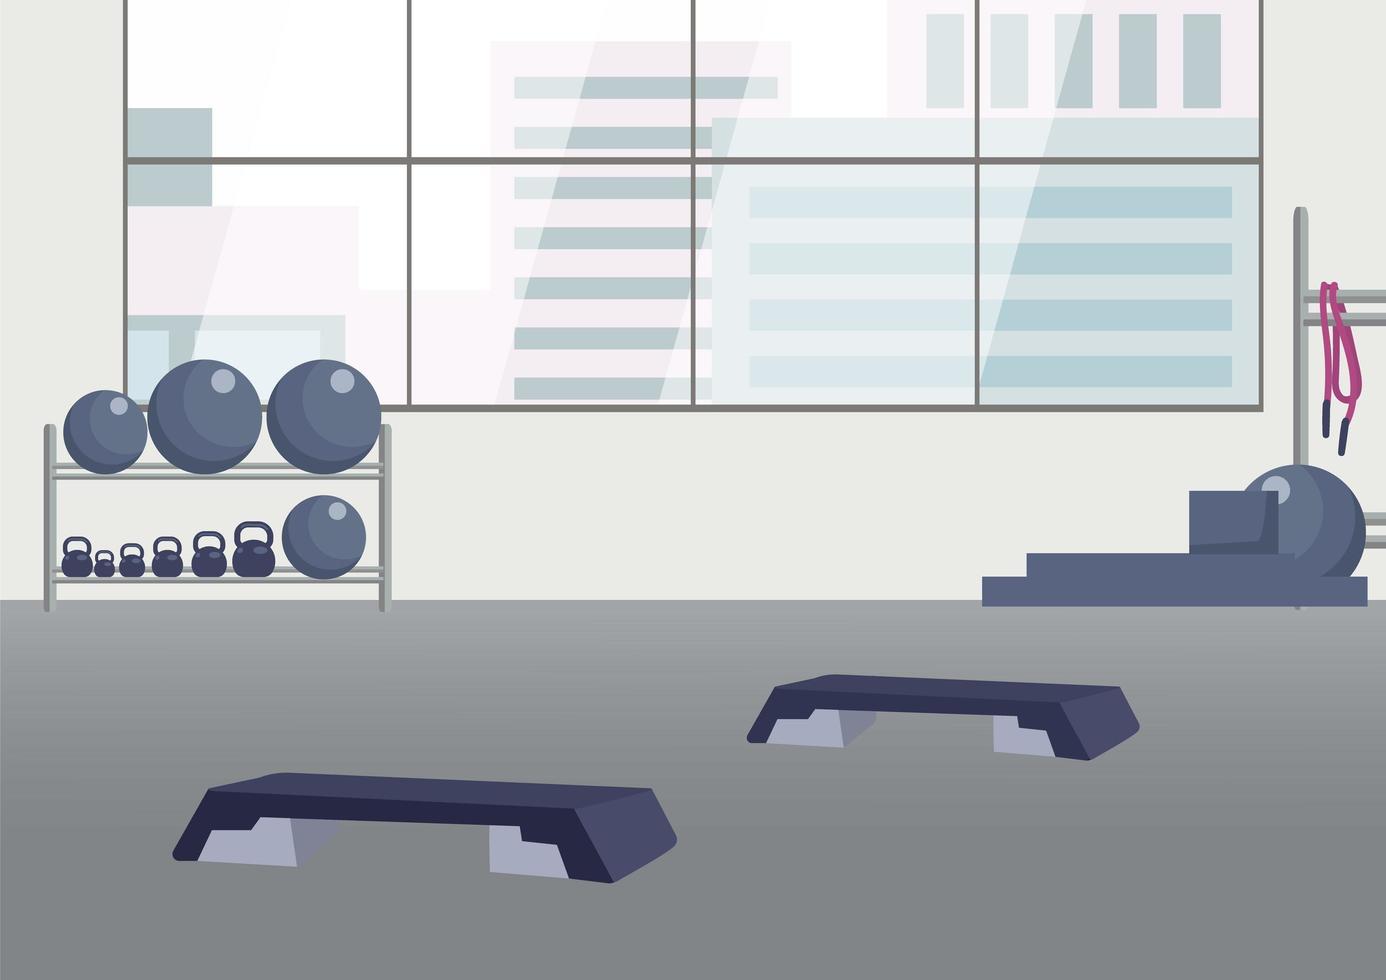 club de fitness vide vecteur